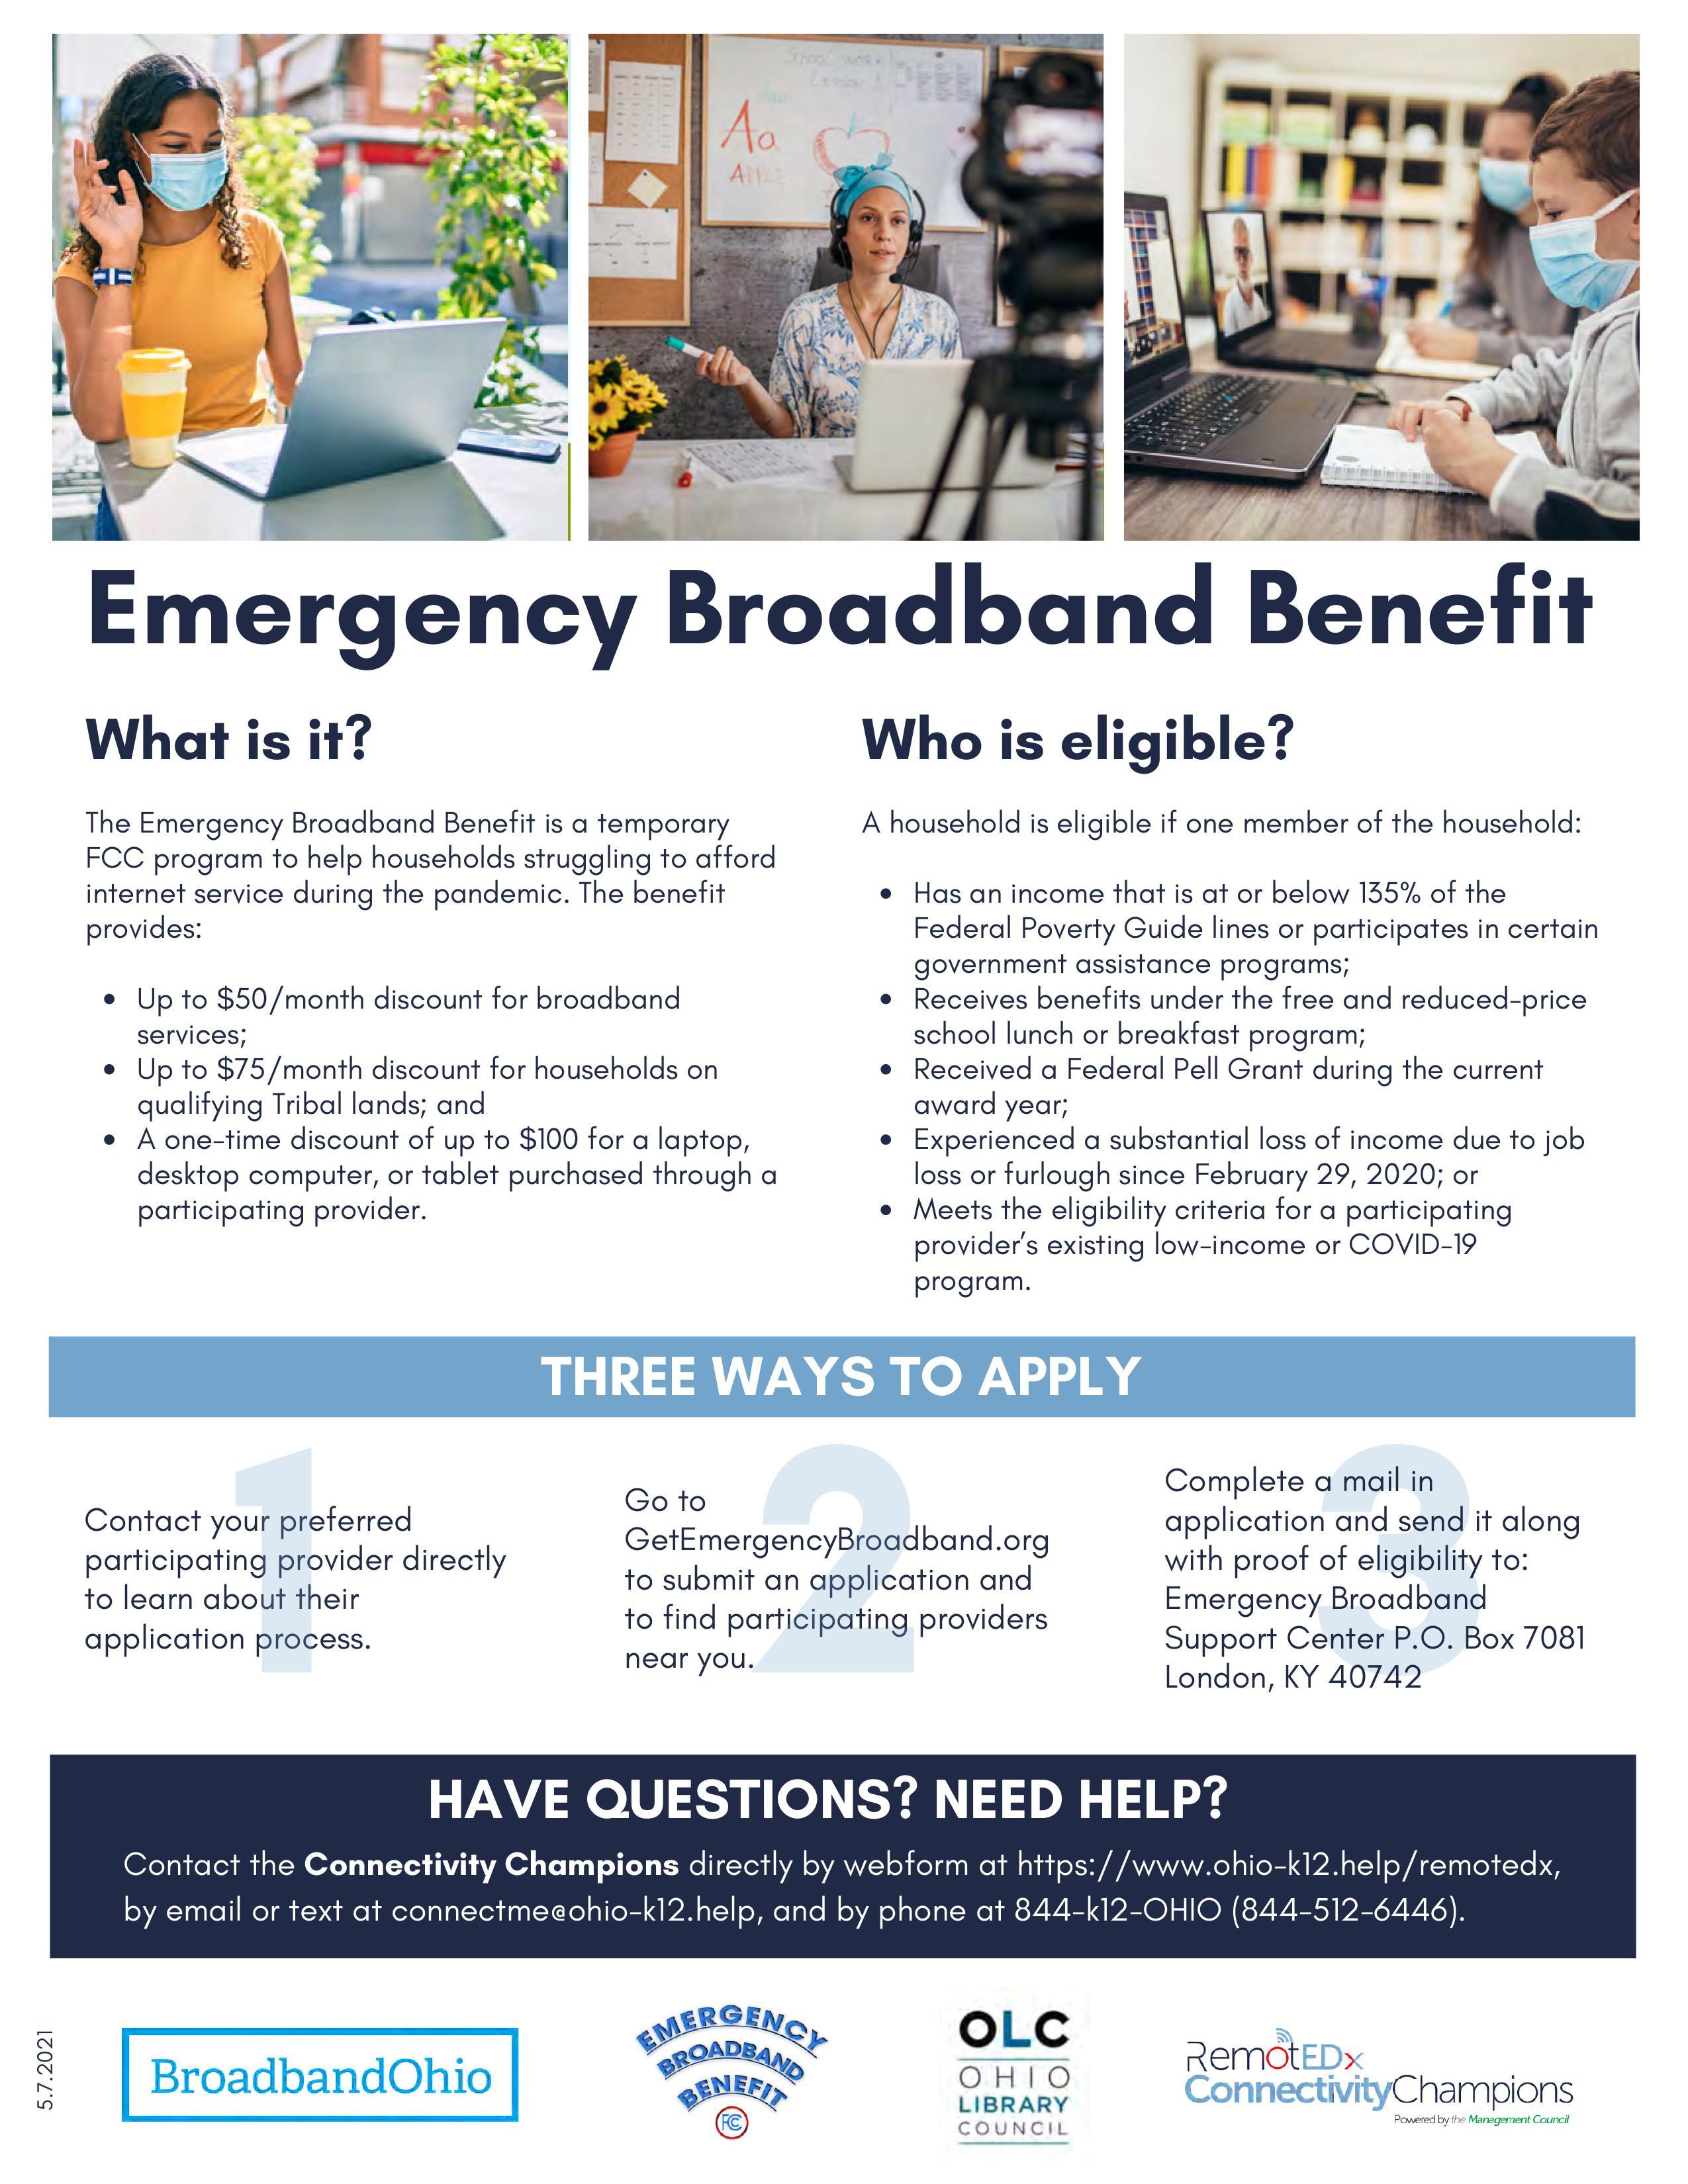 Emergency Broadband flyer